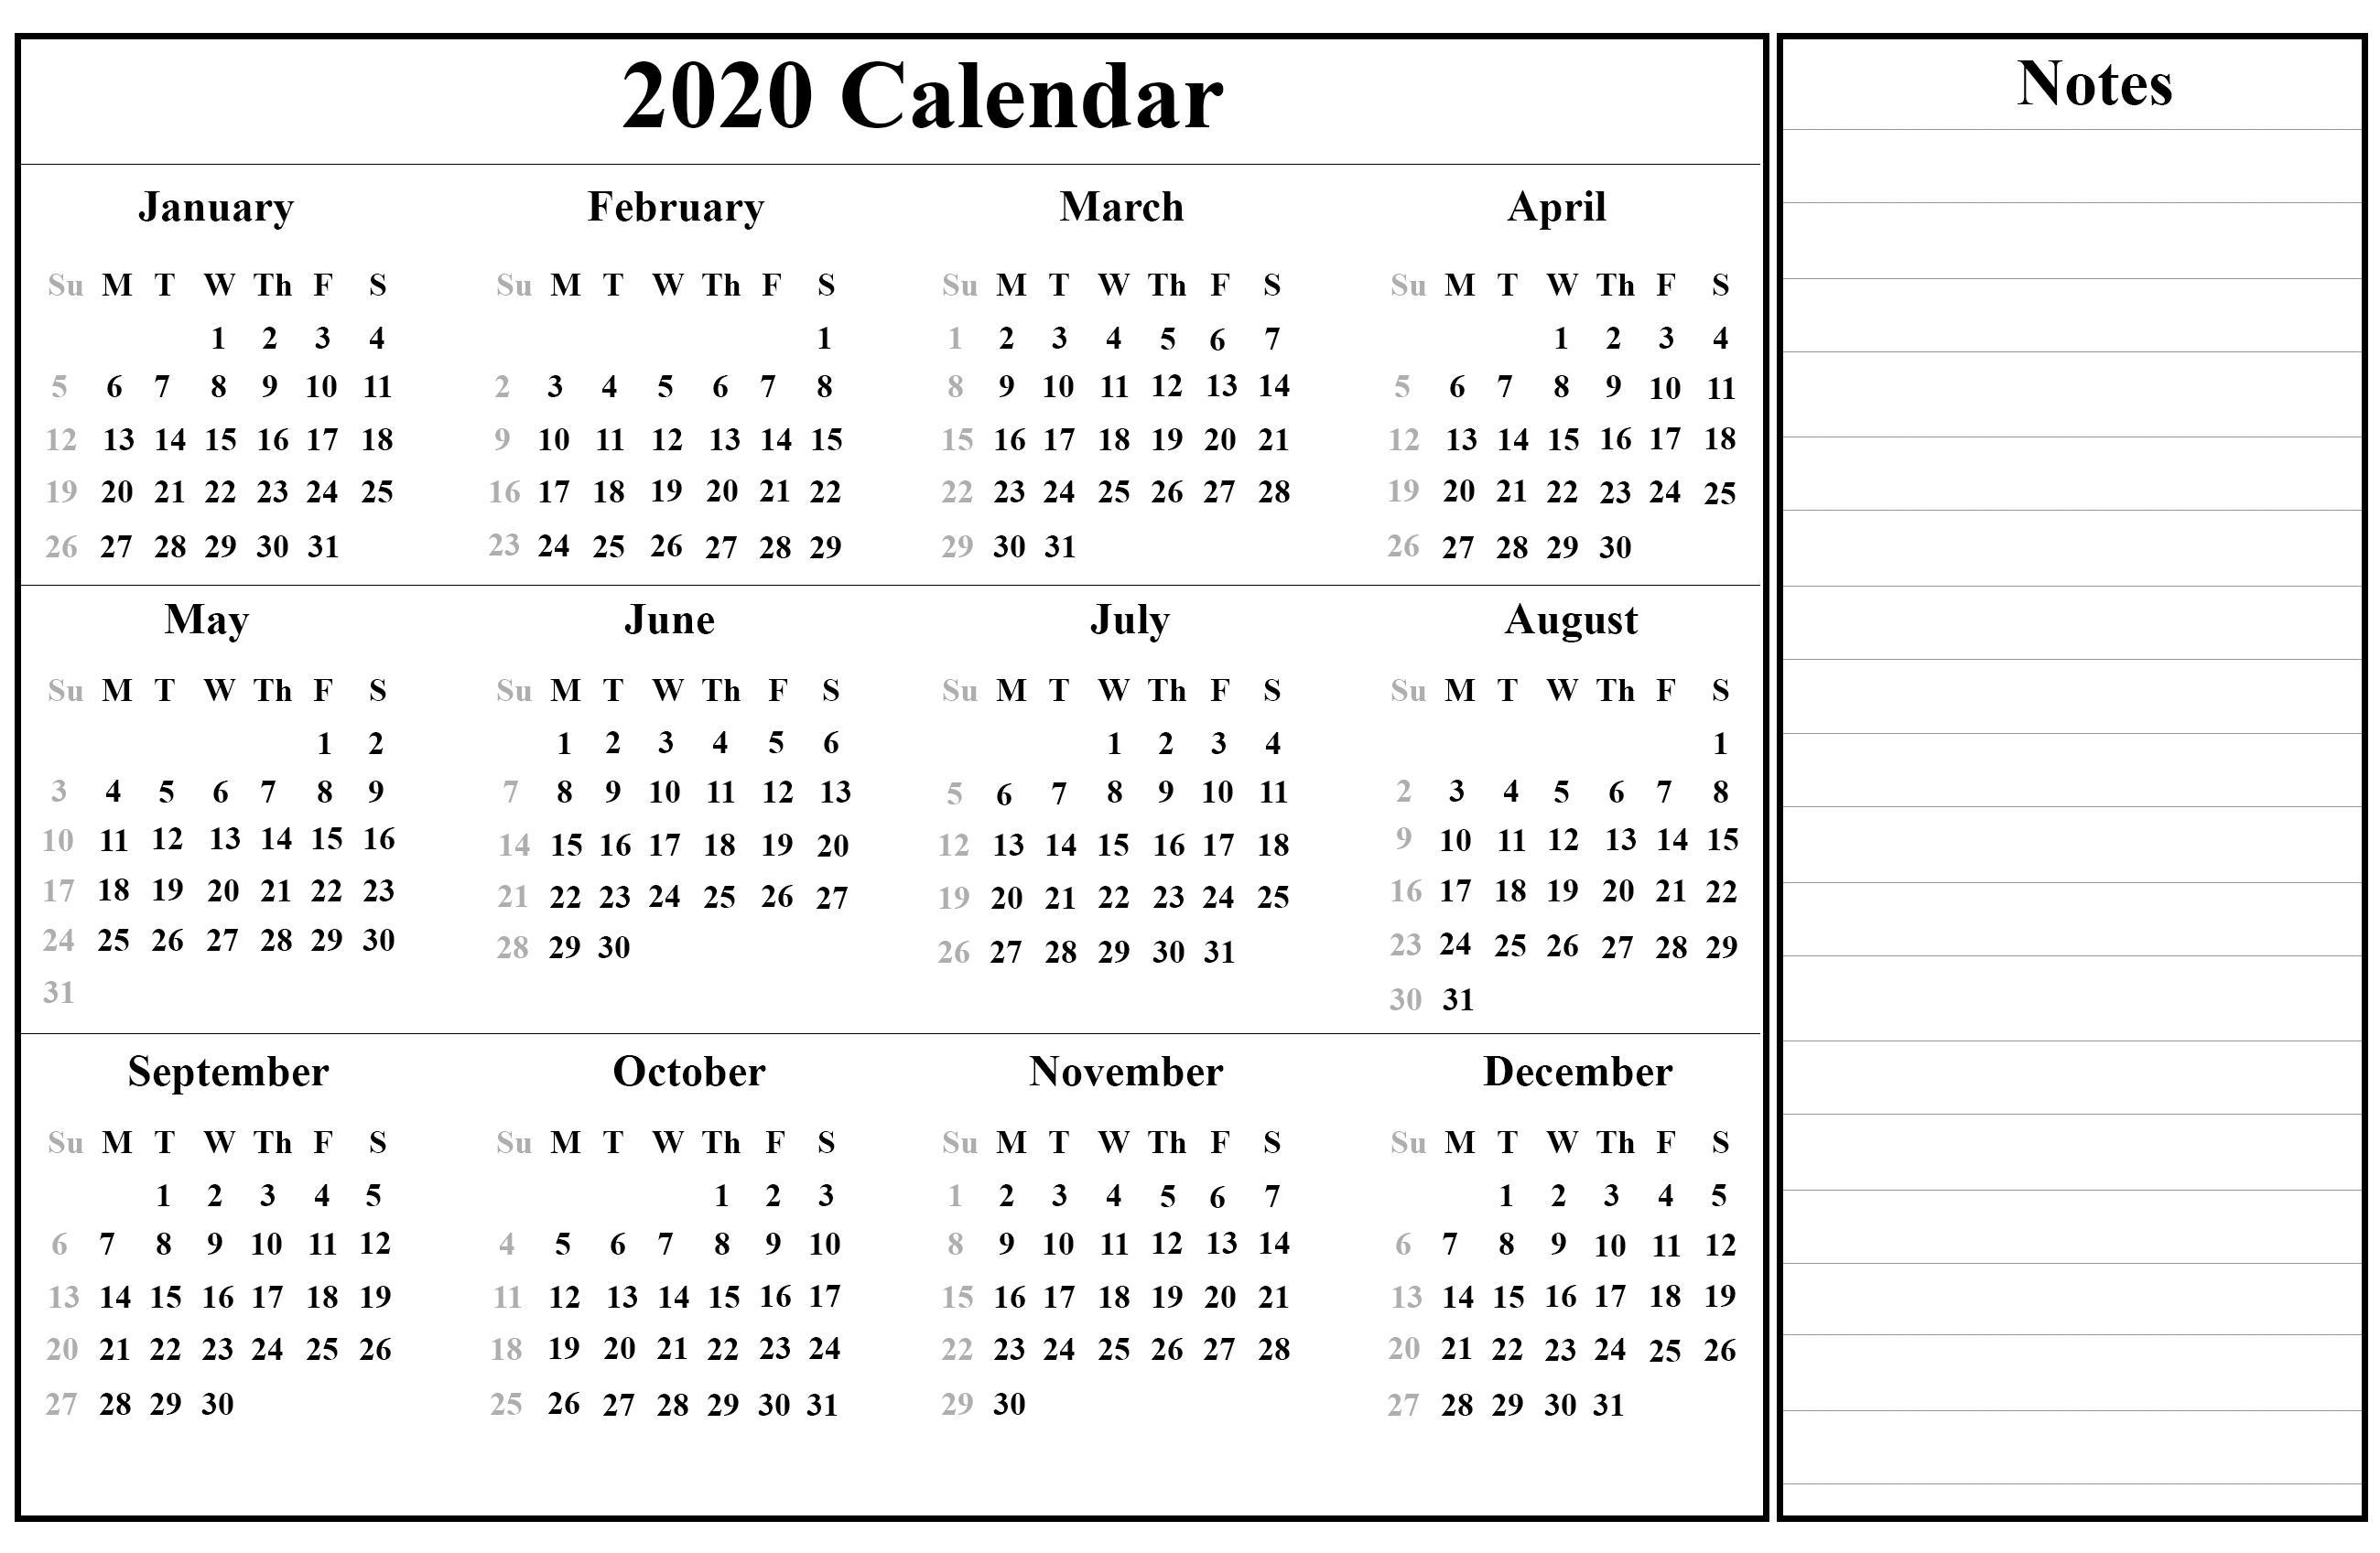 Nanakshahi Calendar 2020 January | Calendar Template Printable-Gujarati Calendar 2020 January To December